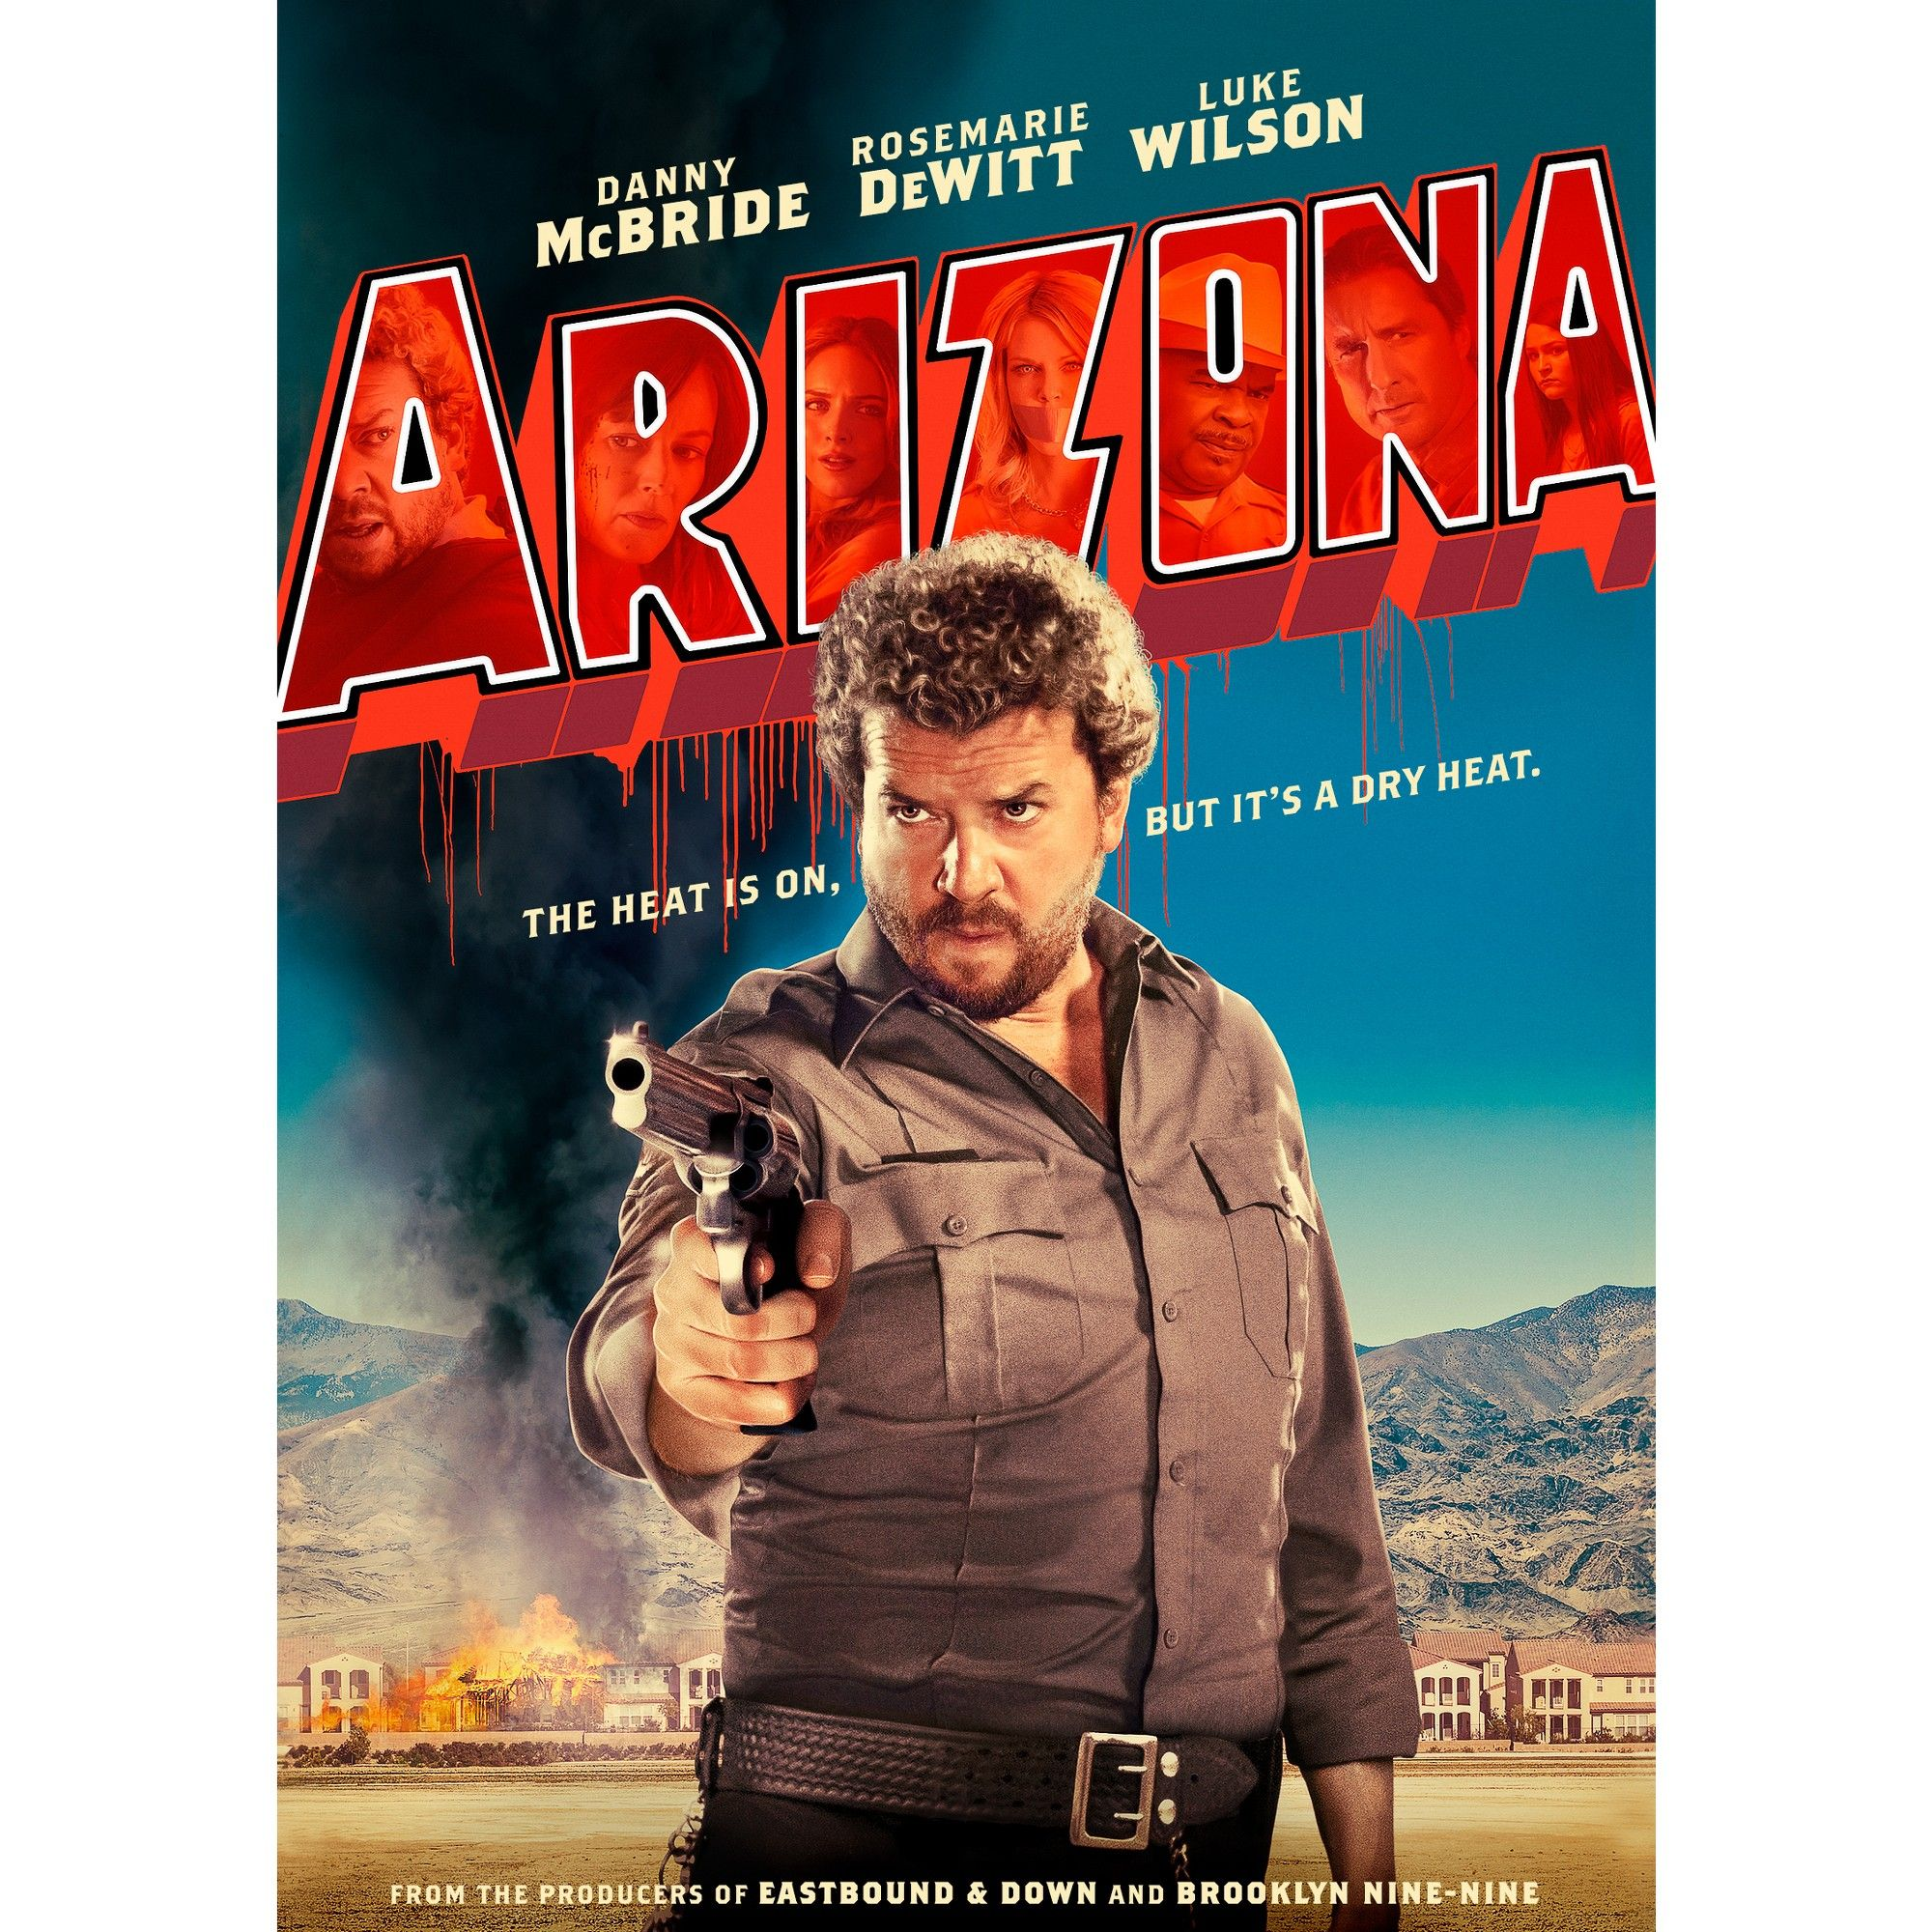 Arizona Dvd Movies Rosemarie Dewitt Arizona Danny Mcbride